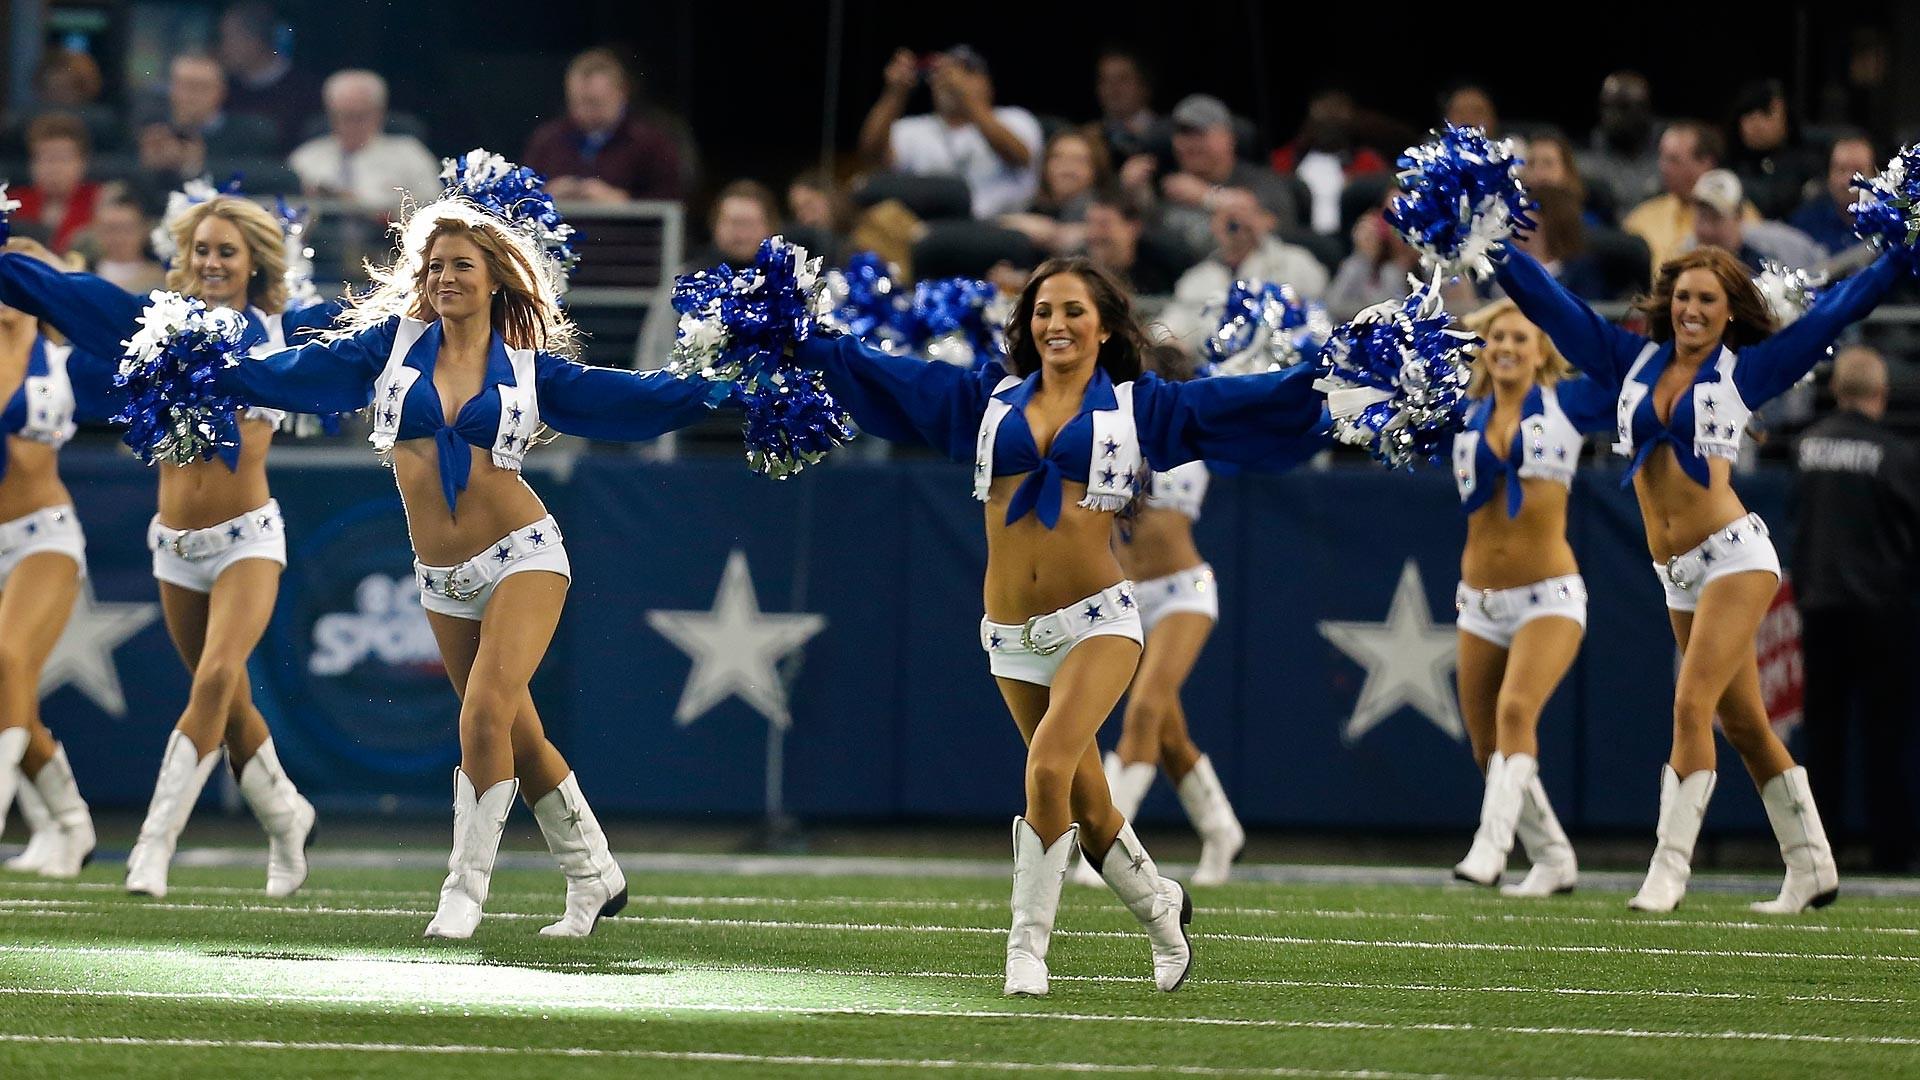 Dallas Cowboys Cheerleaders Wallpaper Full HD.